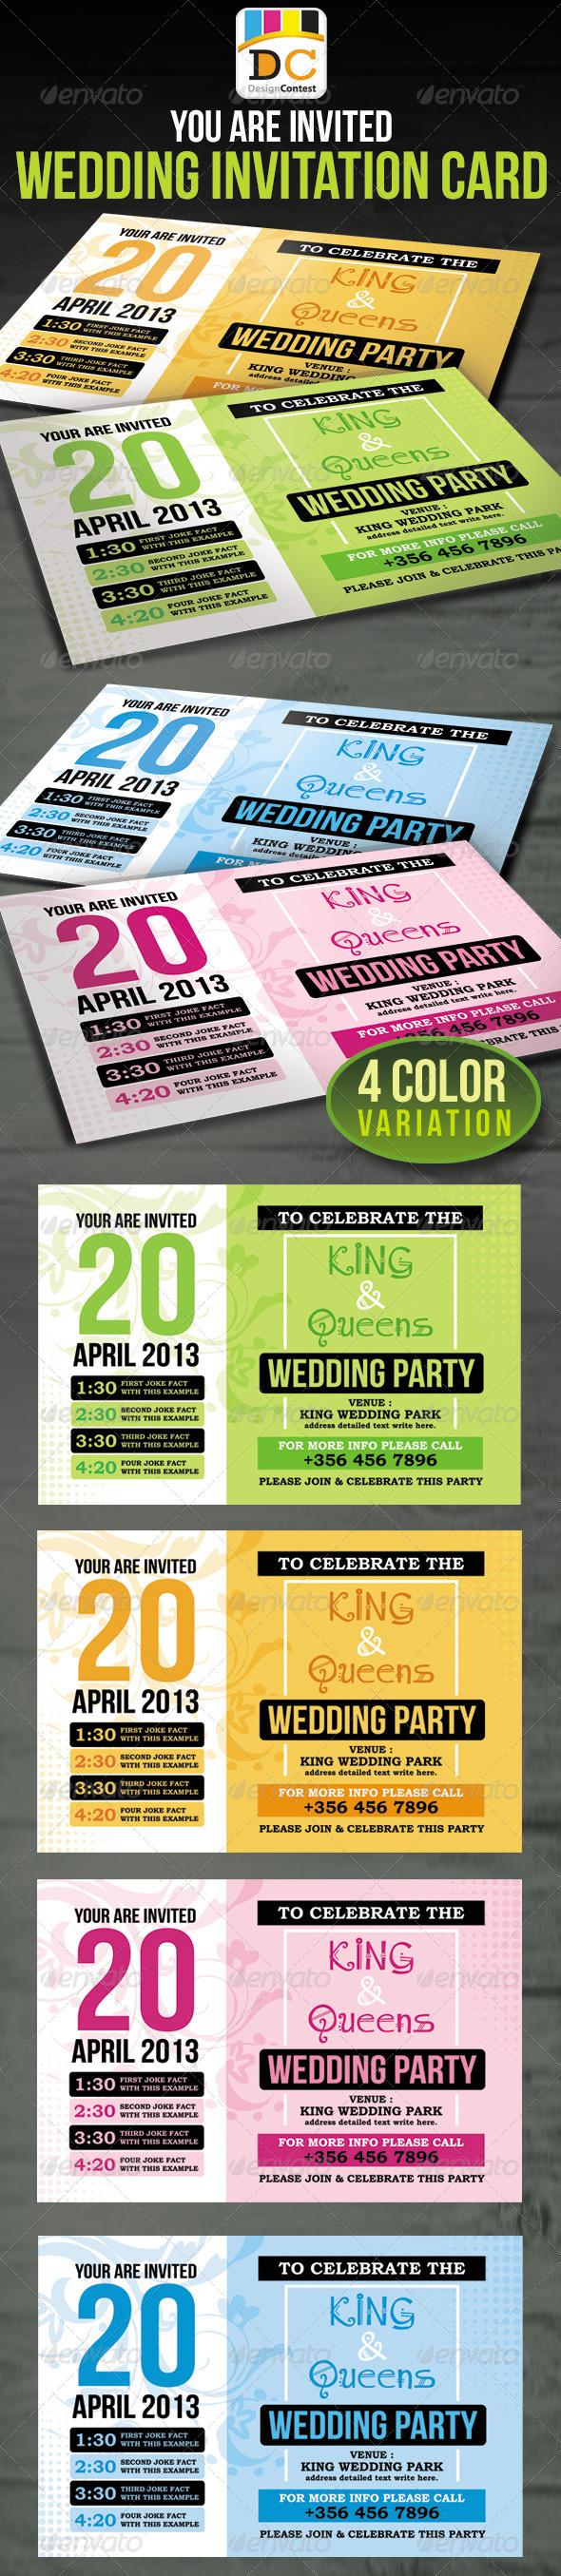 Wedding Party Invitation Card - Weddings Cards & Invites